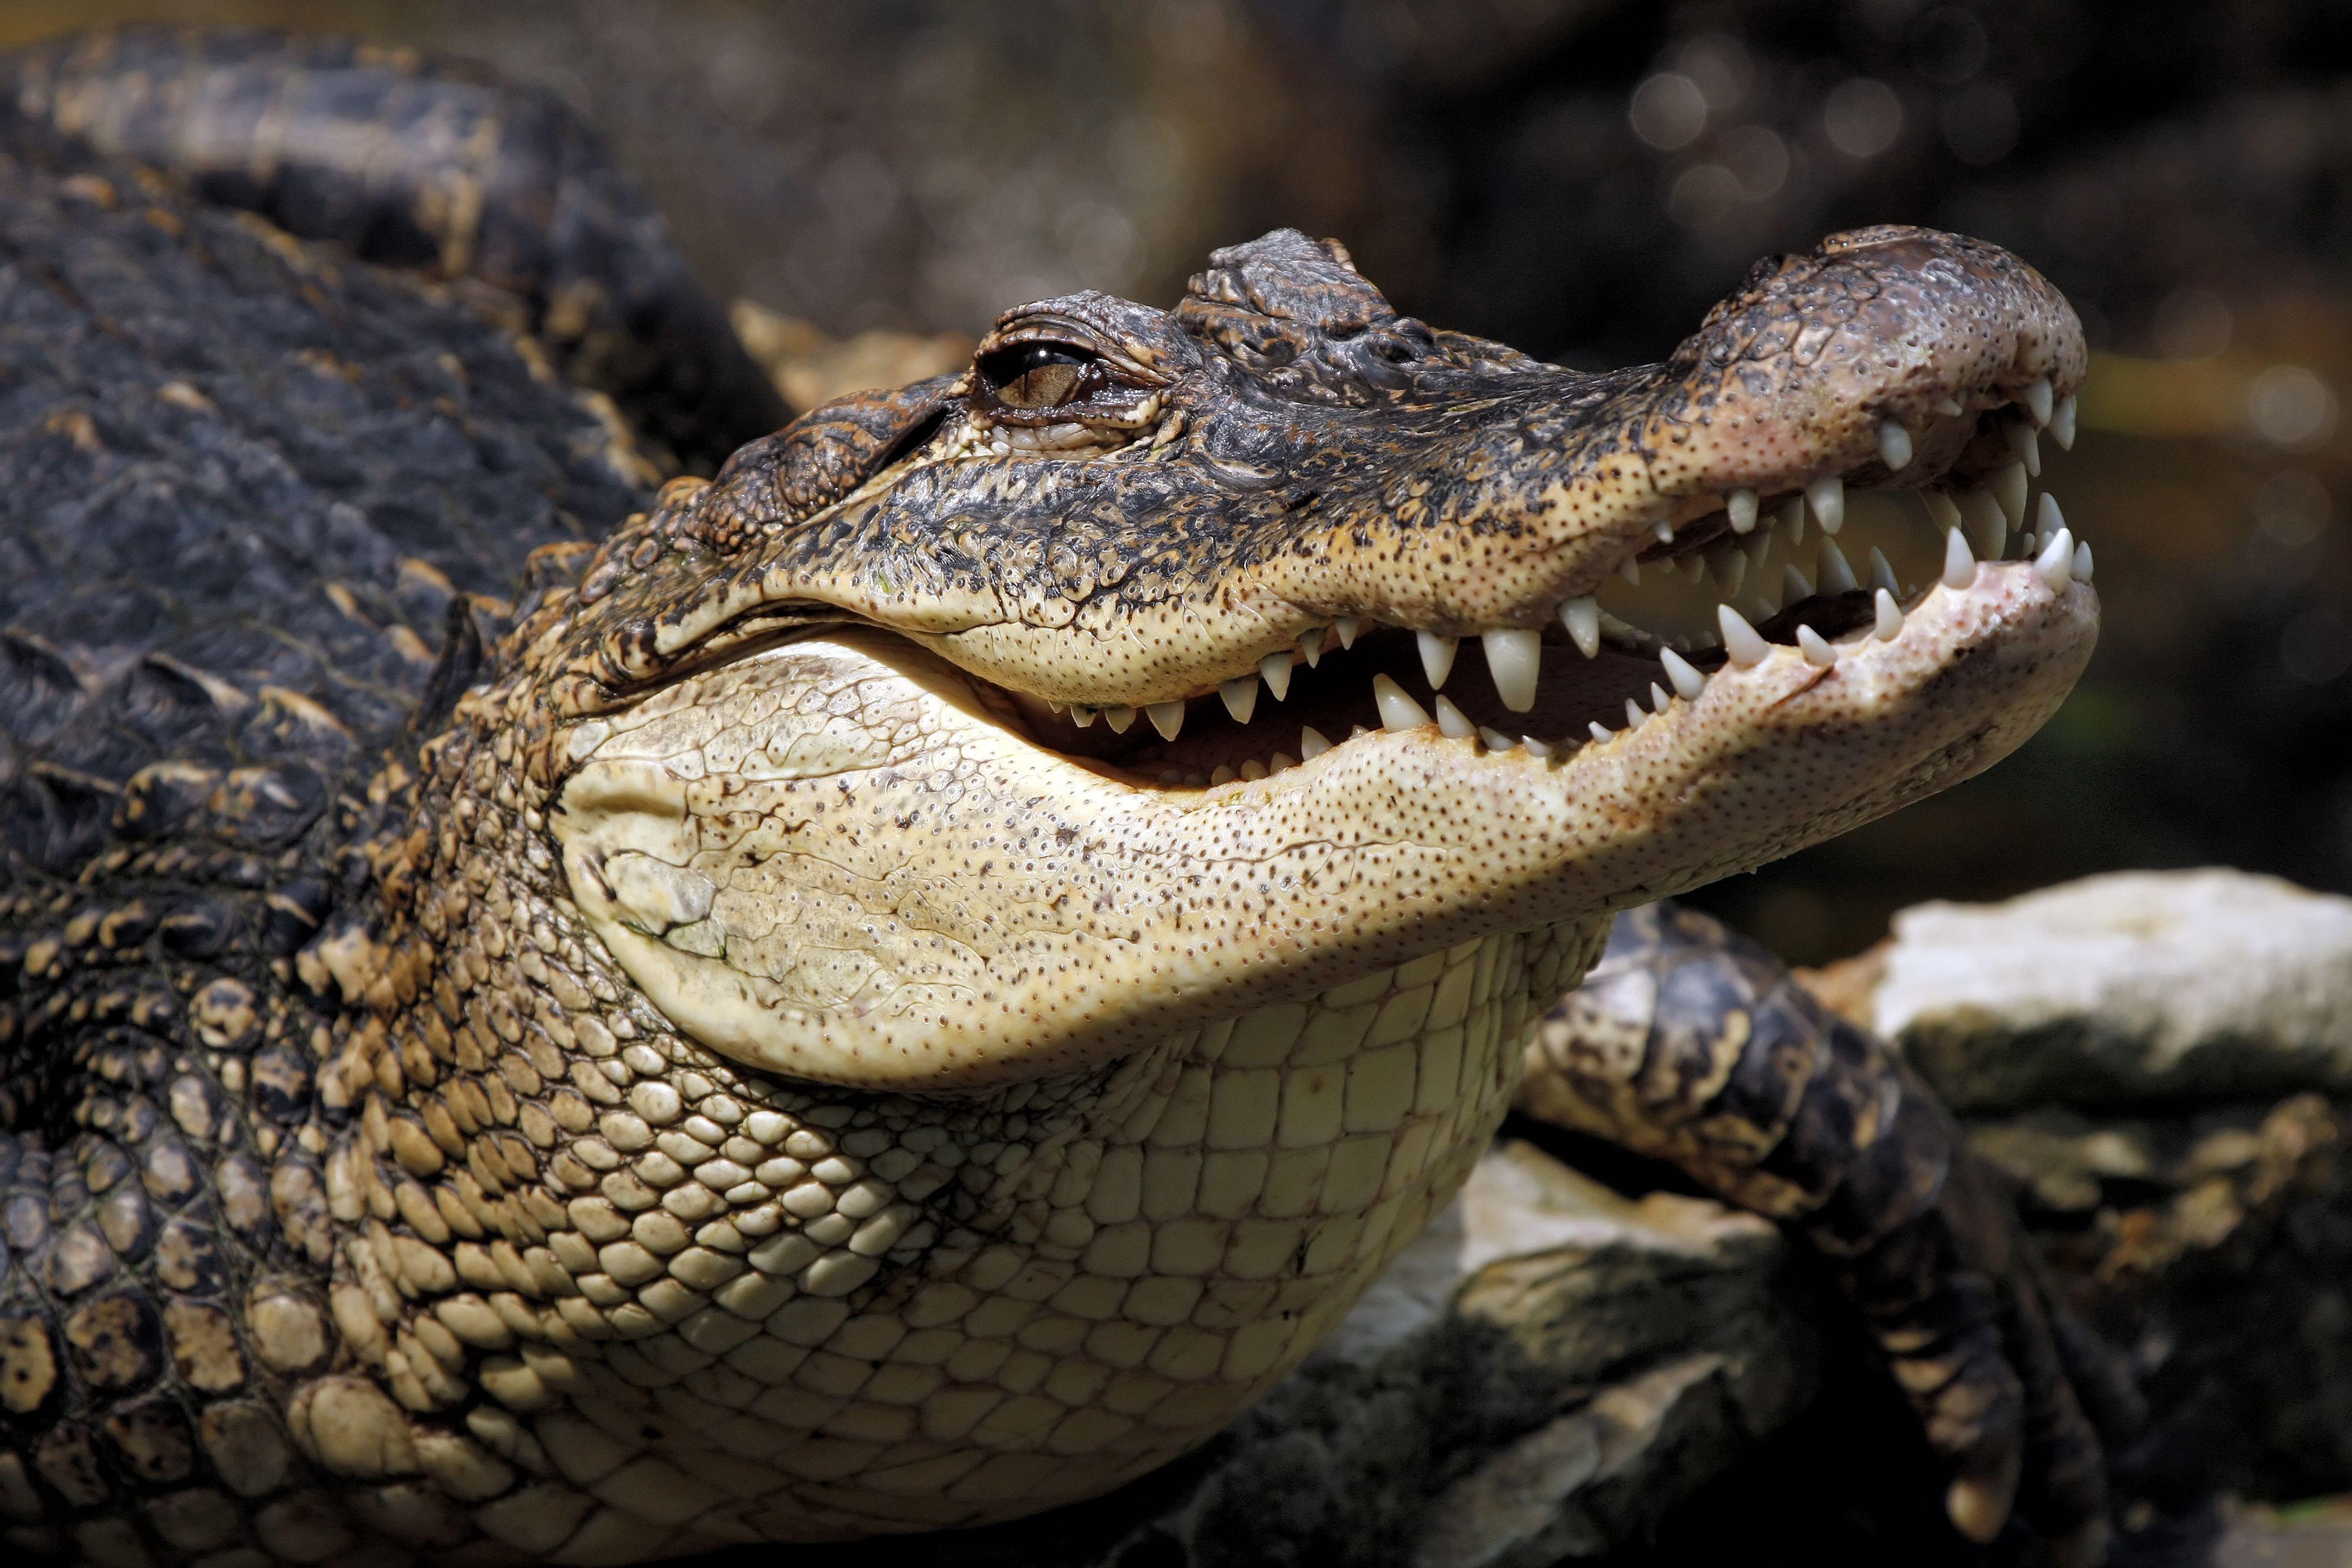 Crocodile 4k Ultra HD Wallpaper | Background Image ...